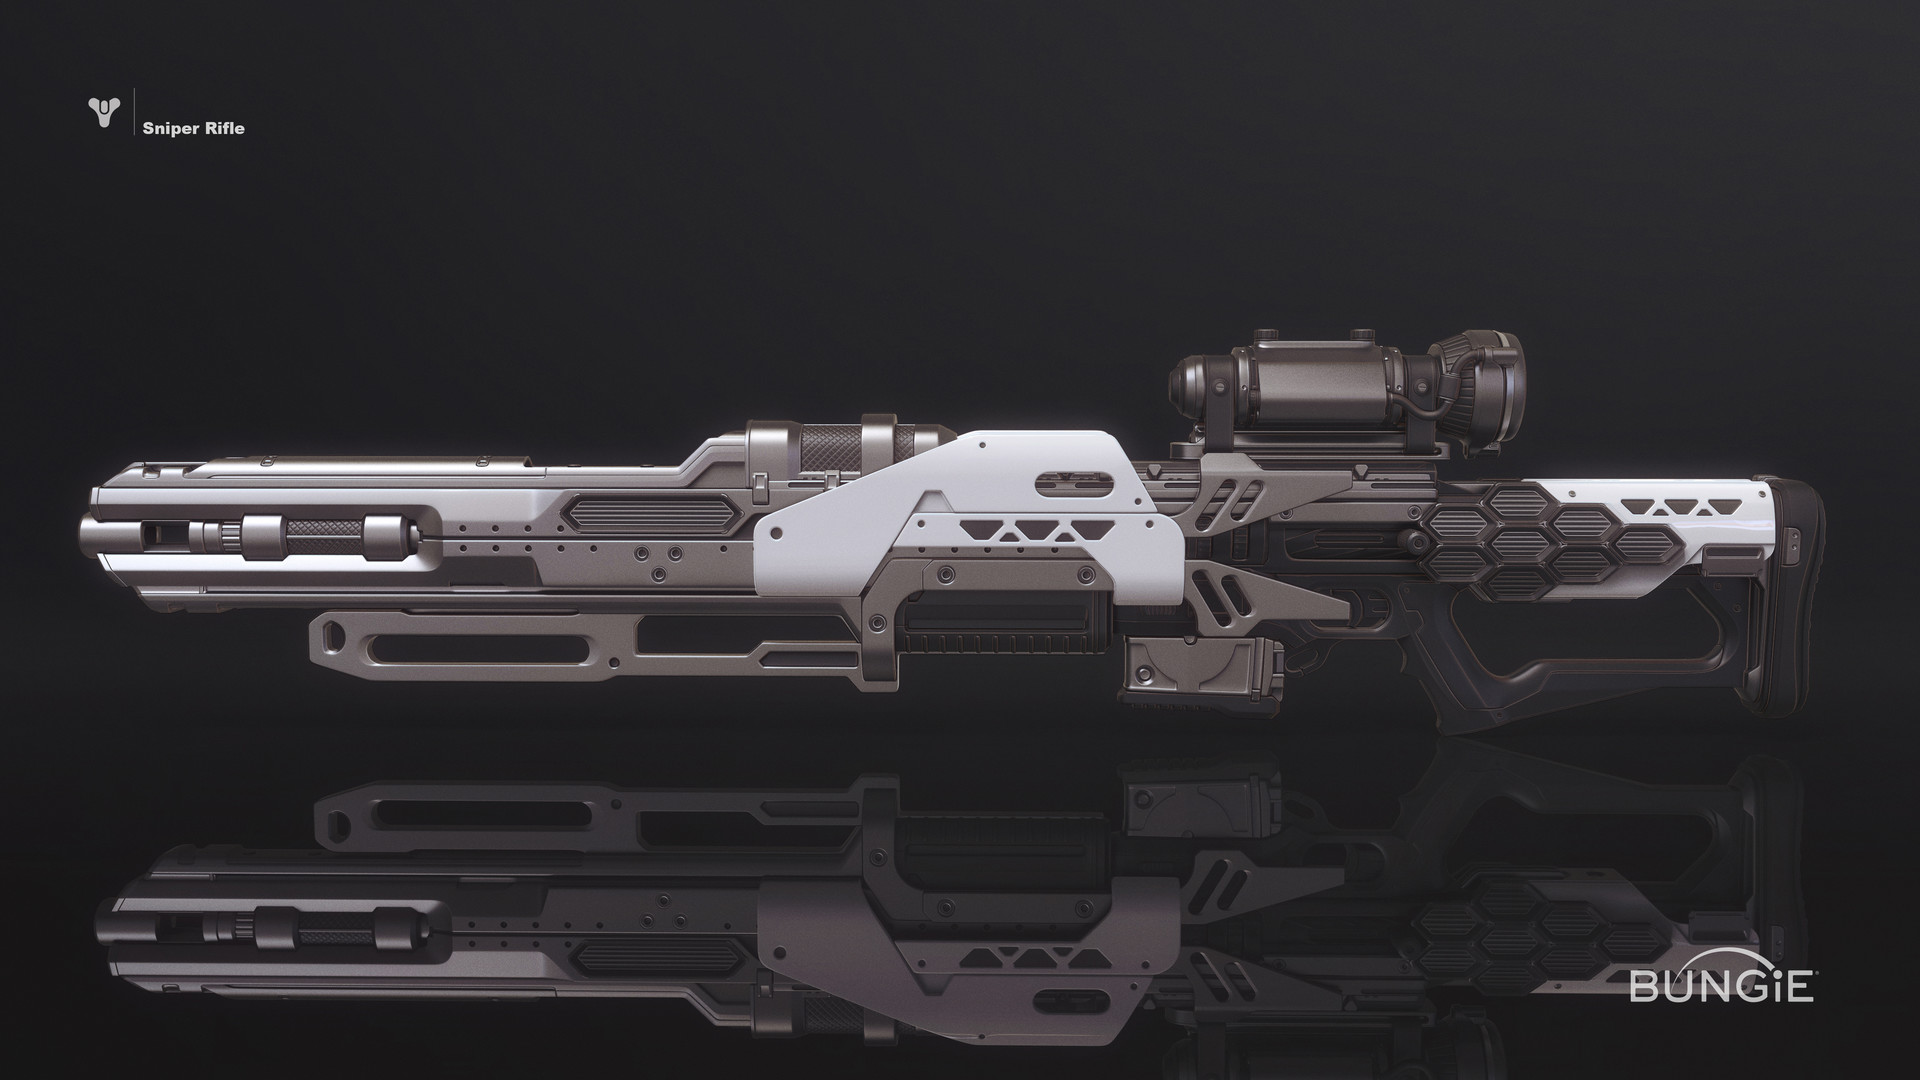 Mark van haitsma d1 sniper rifle 1d